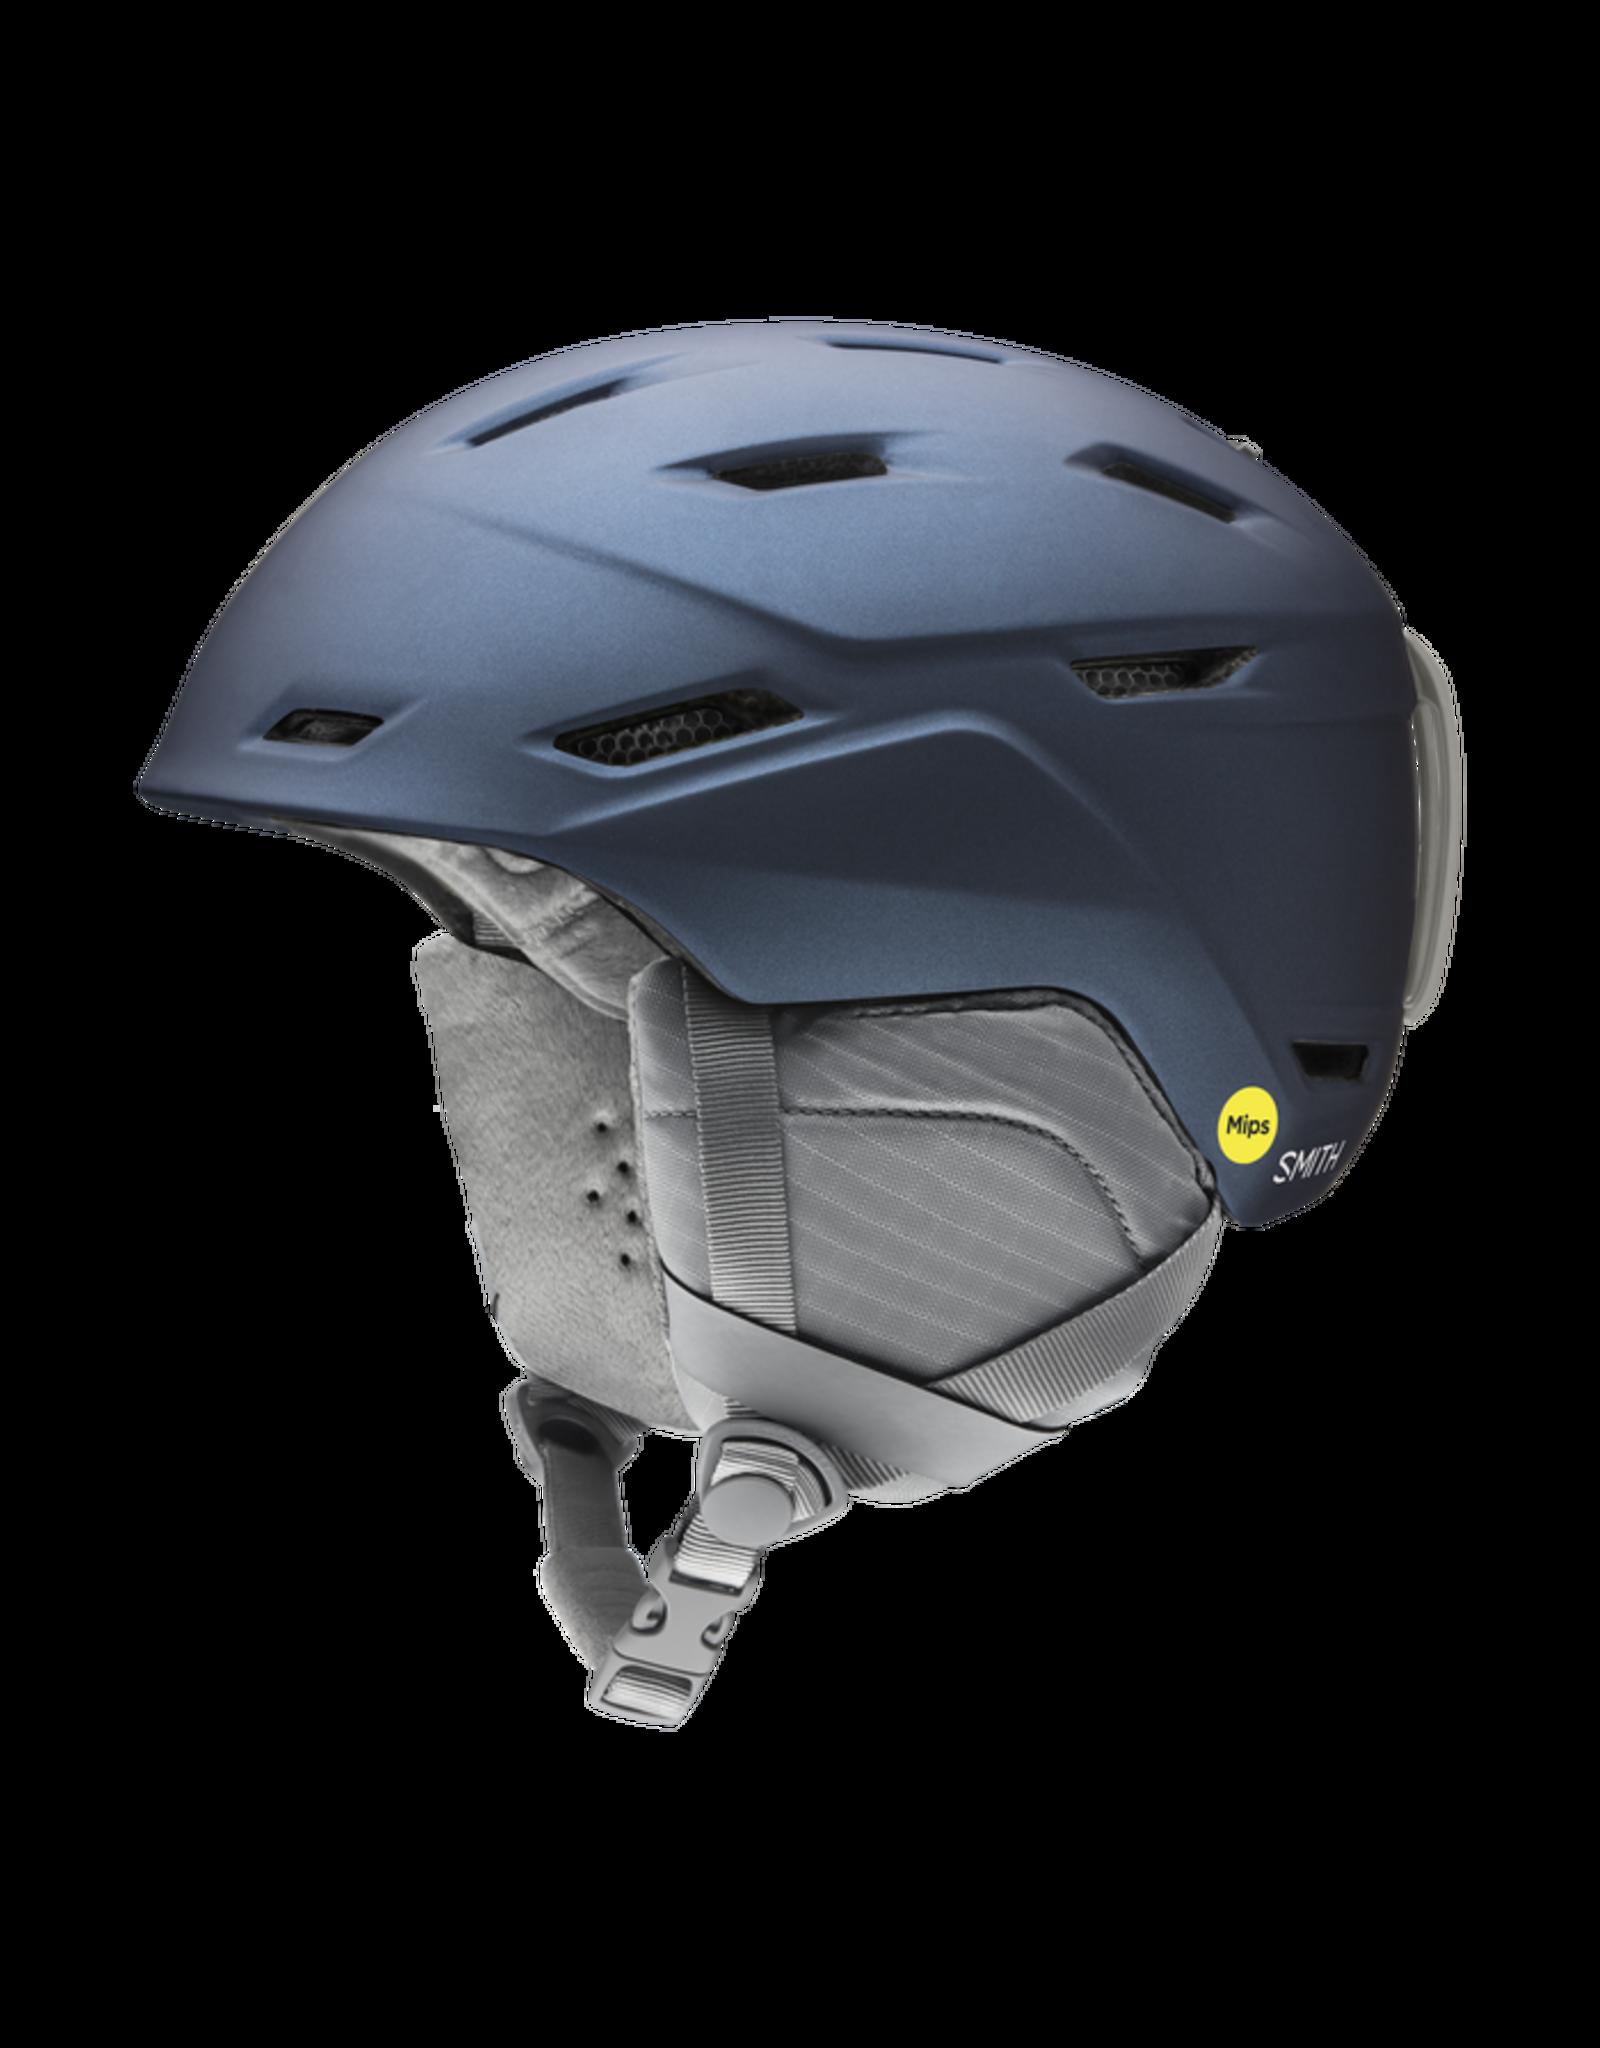 smith optics Smith Mirage mips helmet - Matte French Navy - Medium 55-59cm